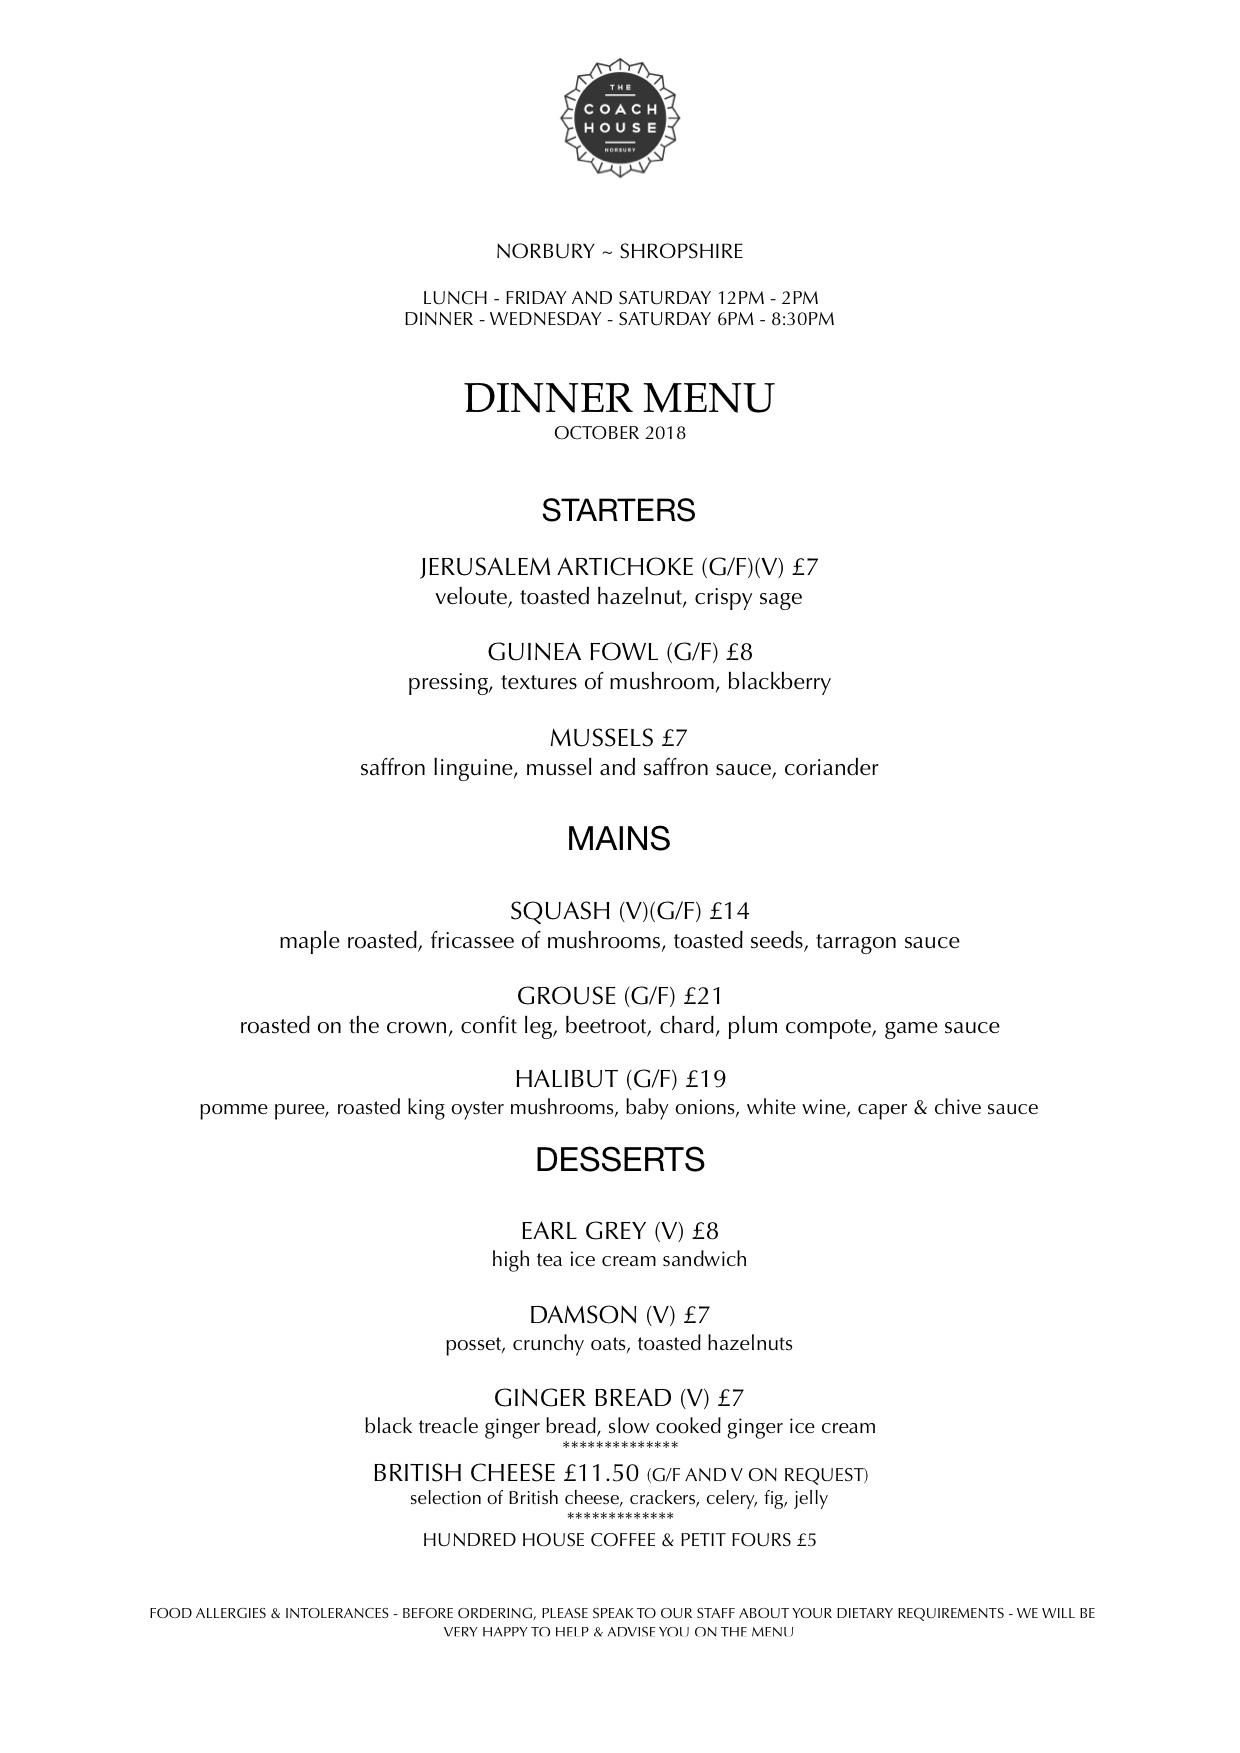 october_2018_dinner_menu.jpeg